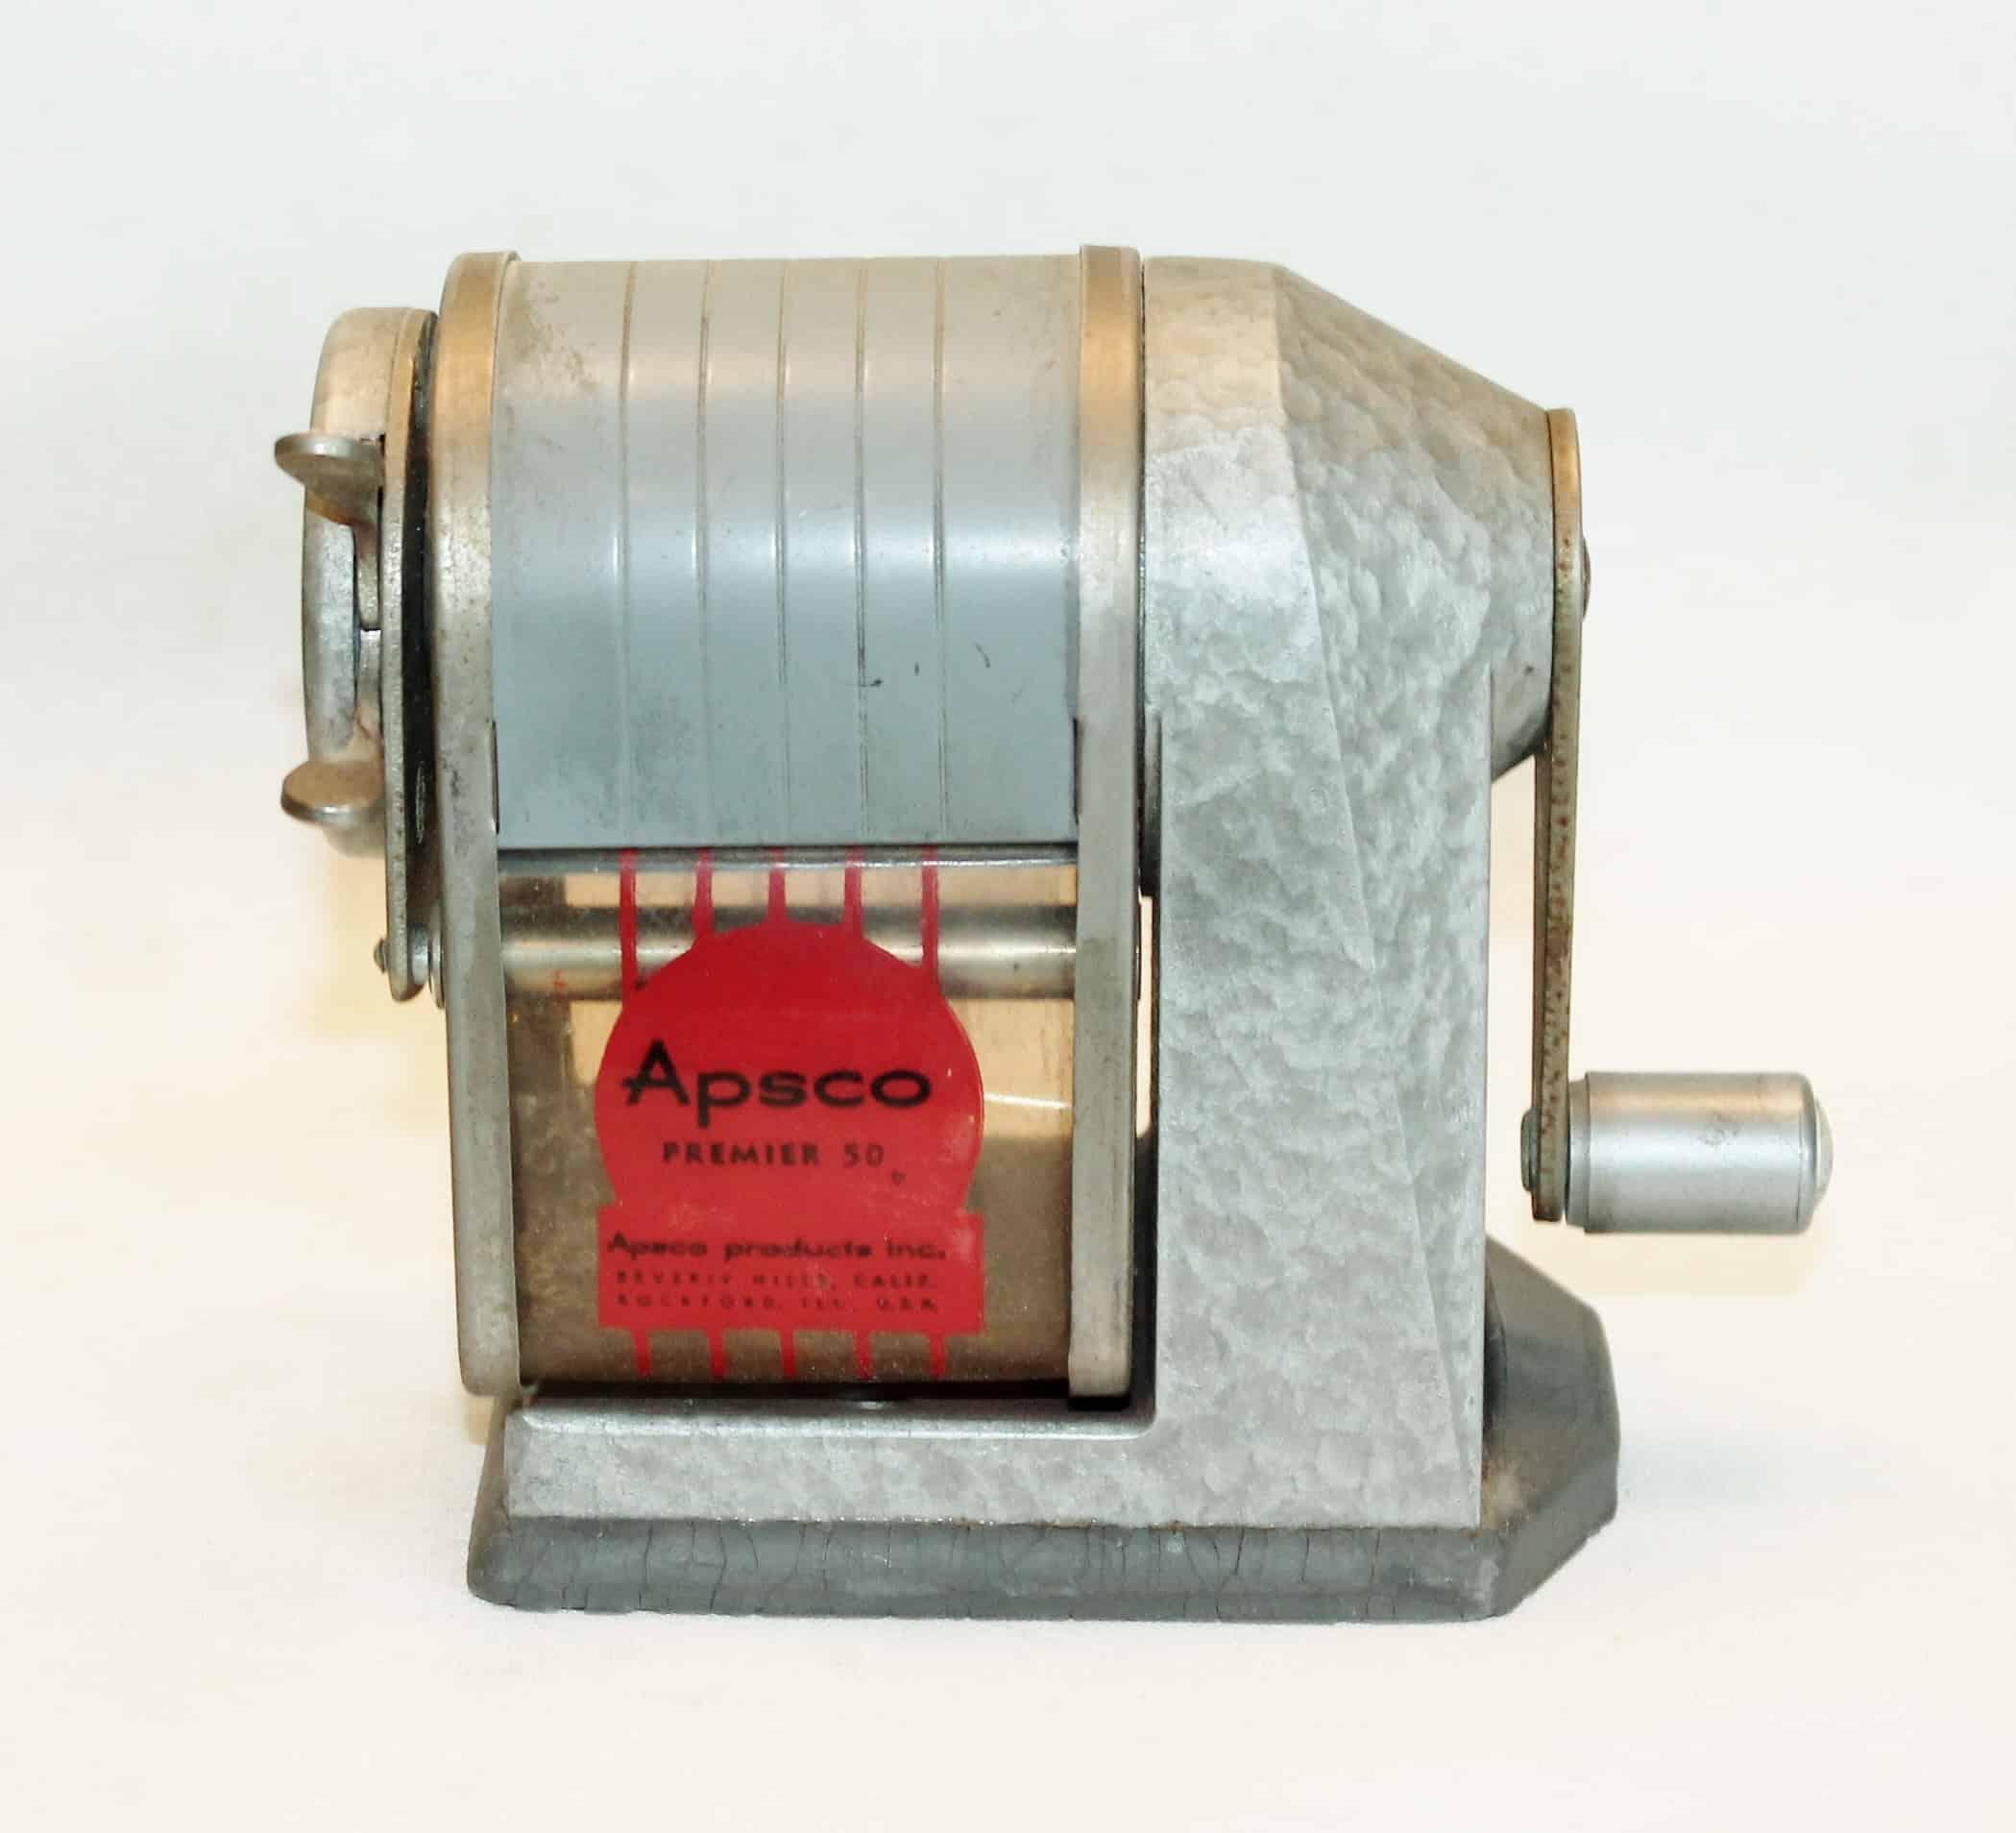 Vintage Apsco Pencil Sharpening